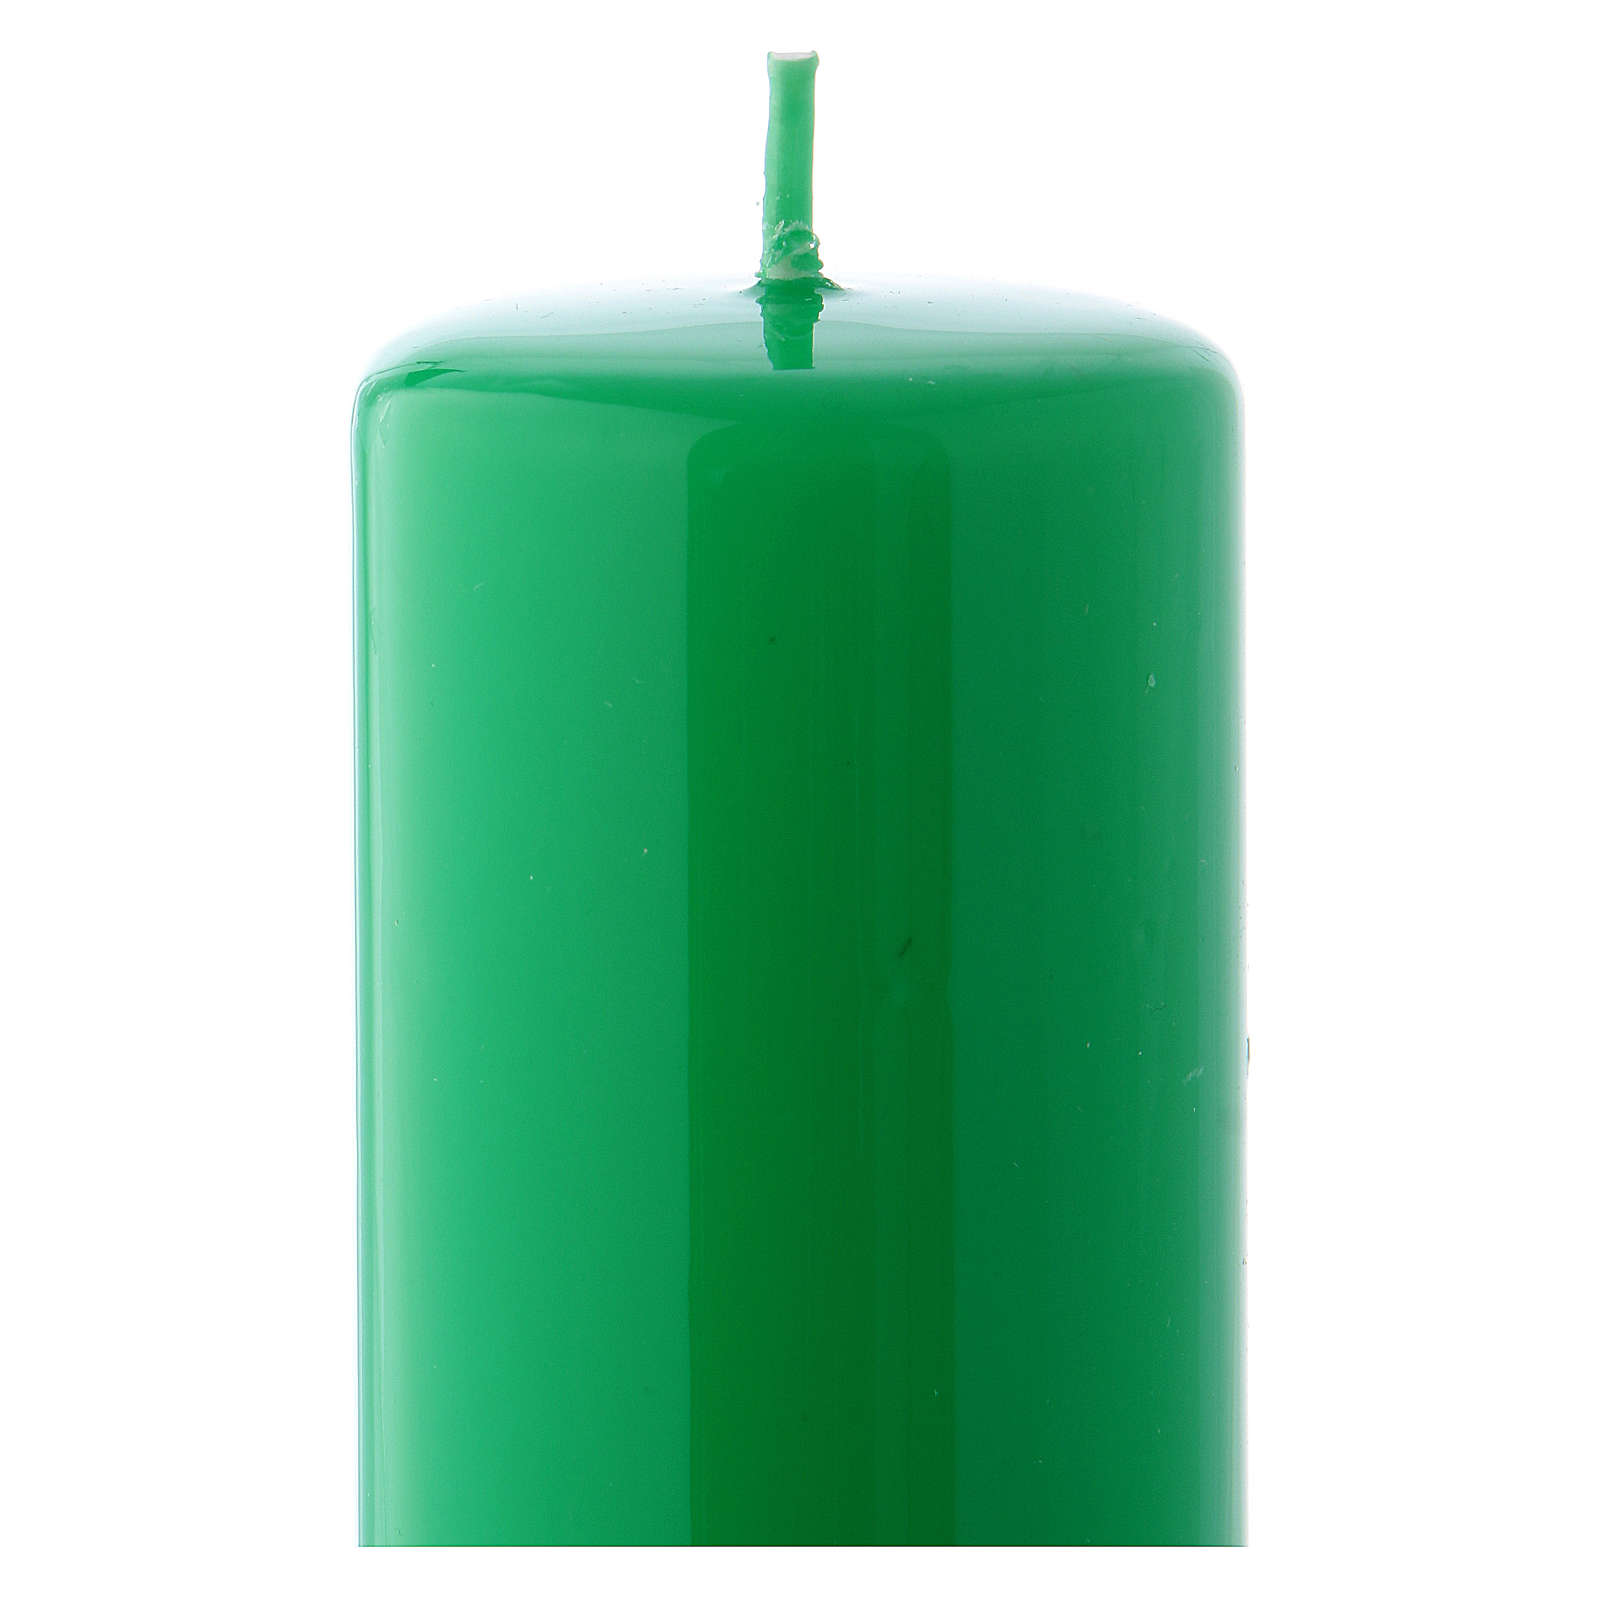 Vela verde Lúcida Lacre 5x13 cm 3